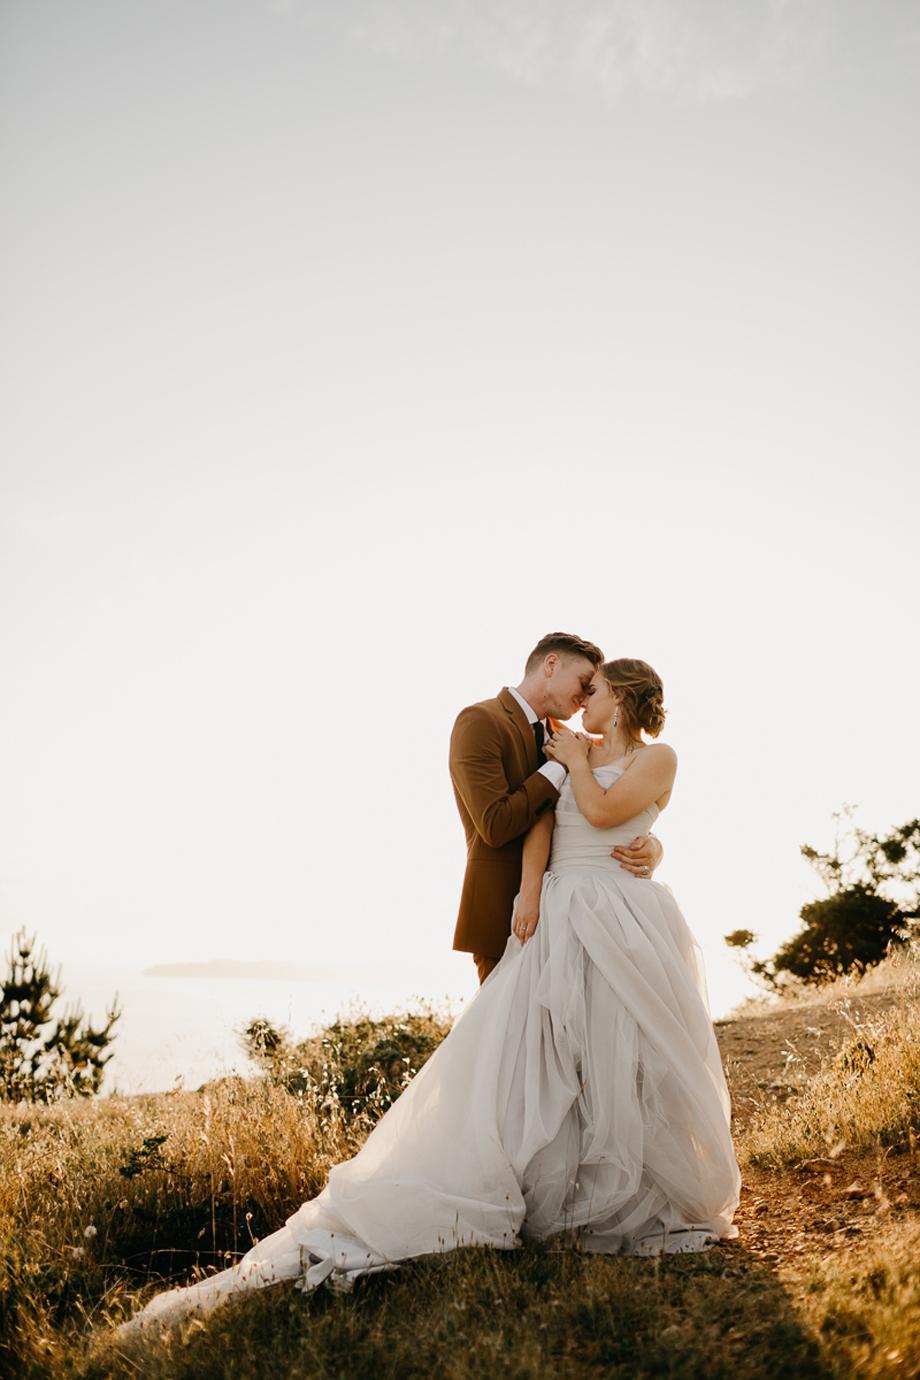 855-destination-wedding-photographer-san-francisco-california--the-livelys.jpg